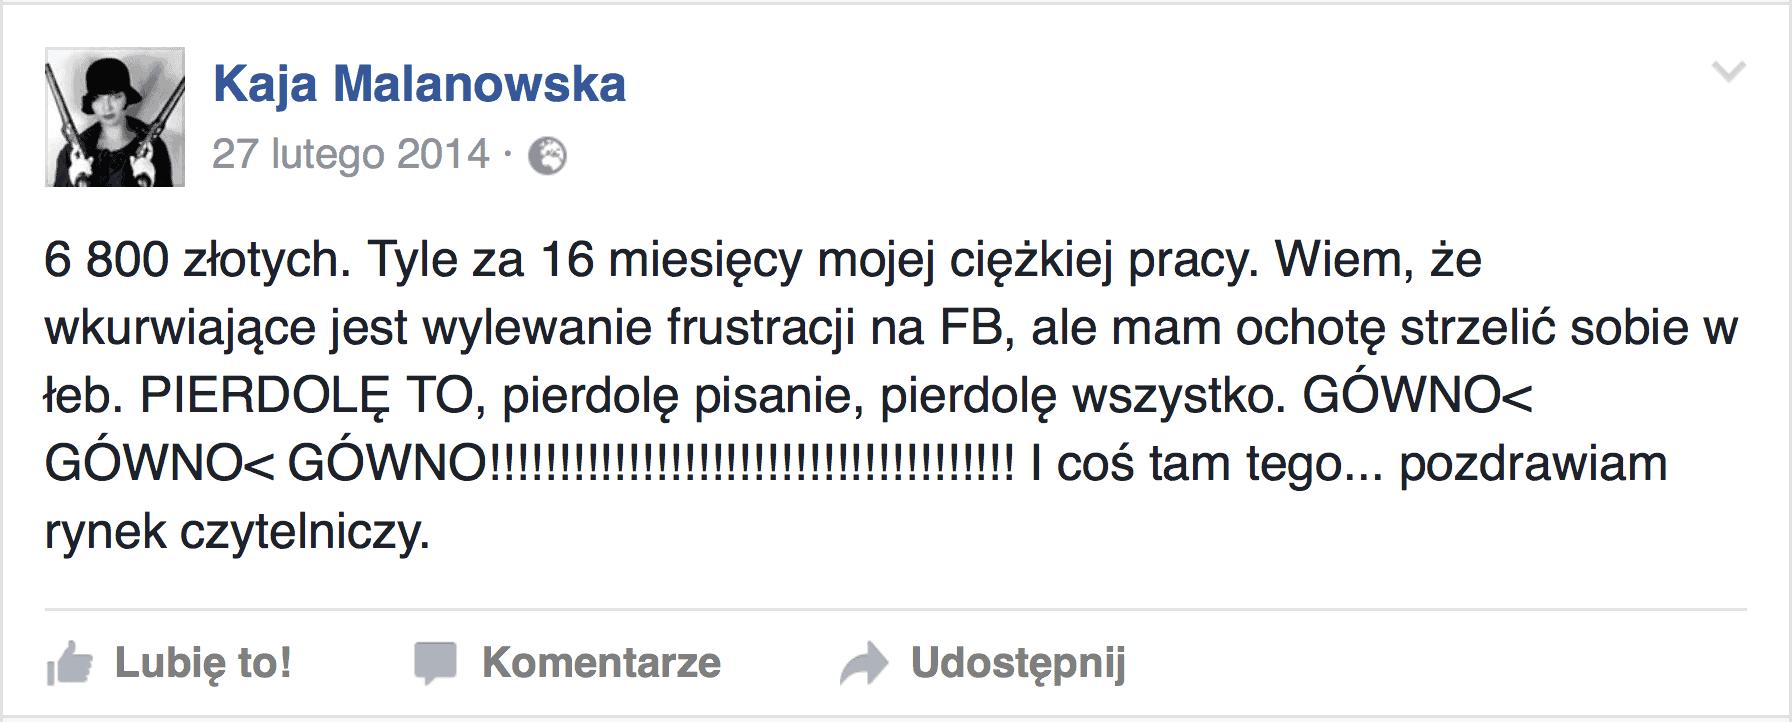 3-Kaja-Malanowska